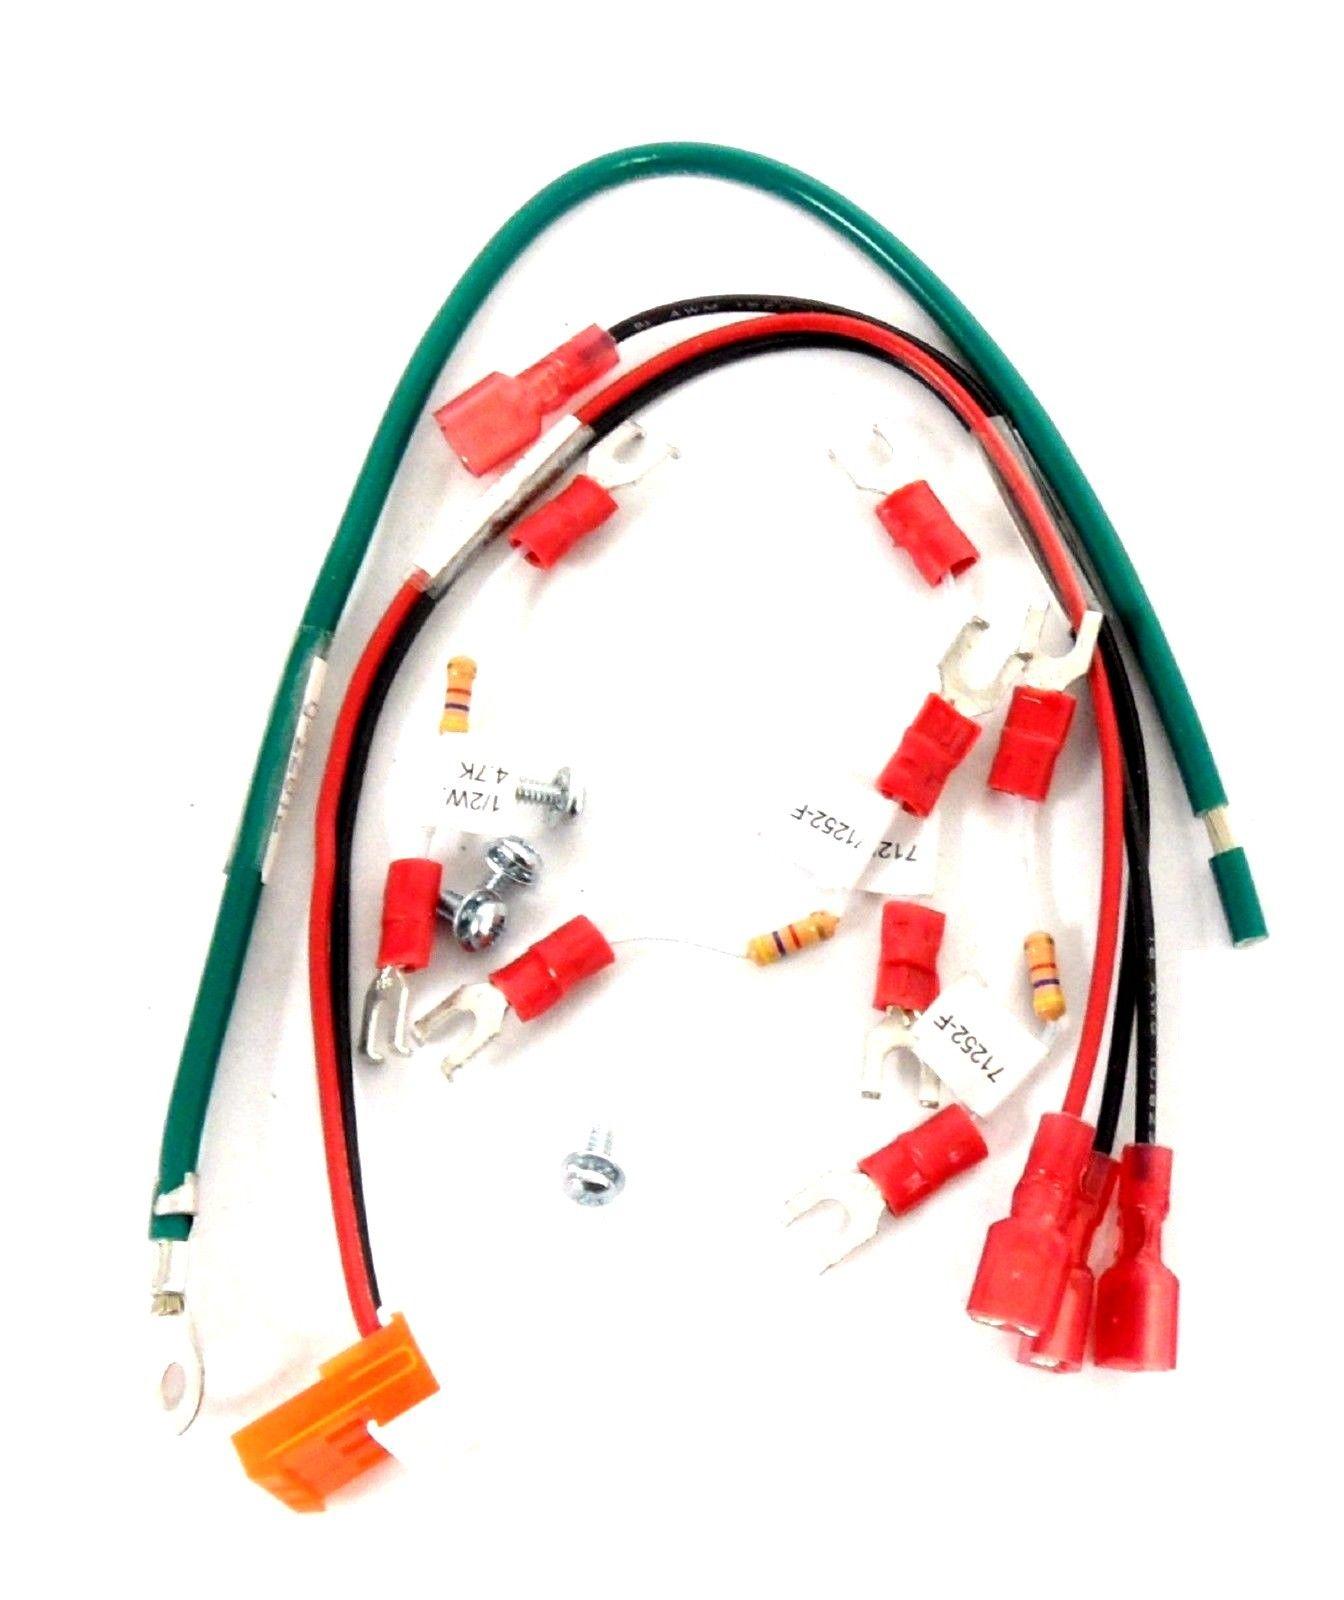 hight resolution of responsive image honeywell 607682 wiring harness